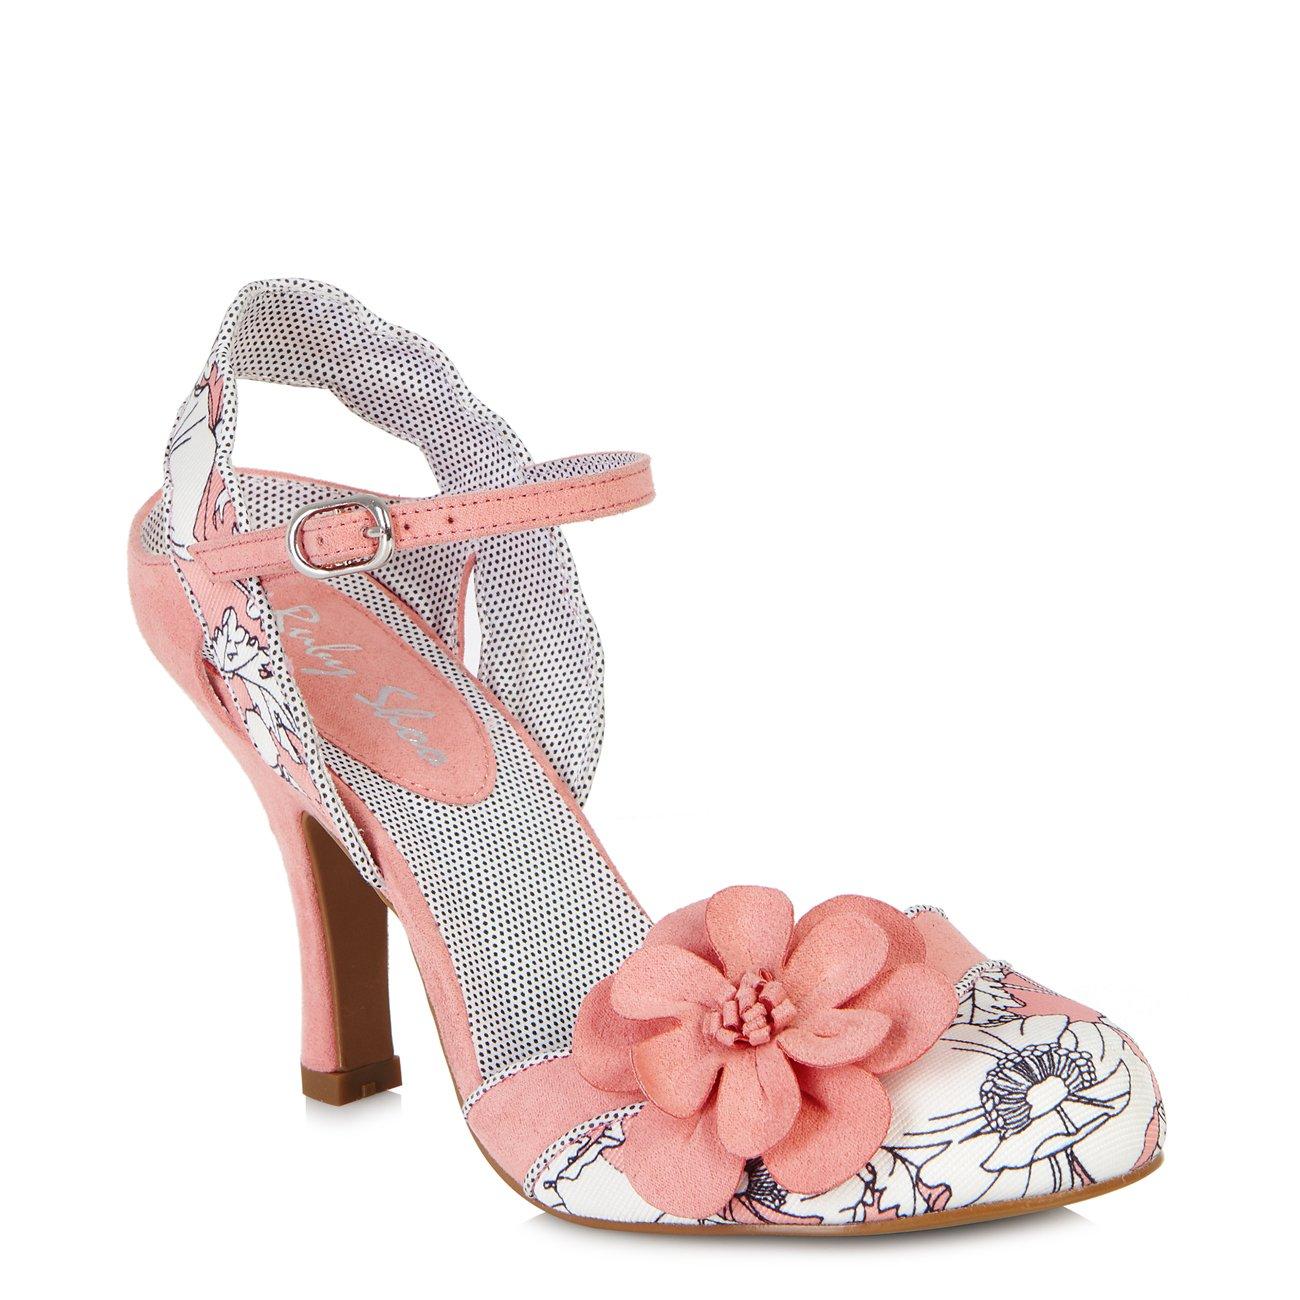 Ruby Shoo Women's Peach Floral Heidi Fabric Slingback Pumps & Rio Bag UK 5 EU 38 by Ruby Shoo (Image #2)